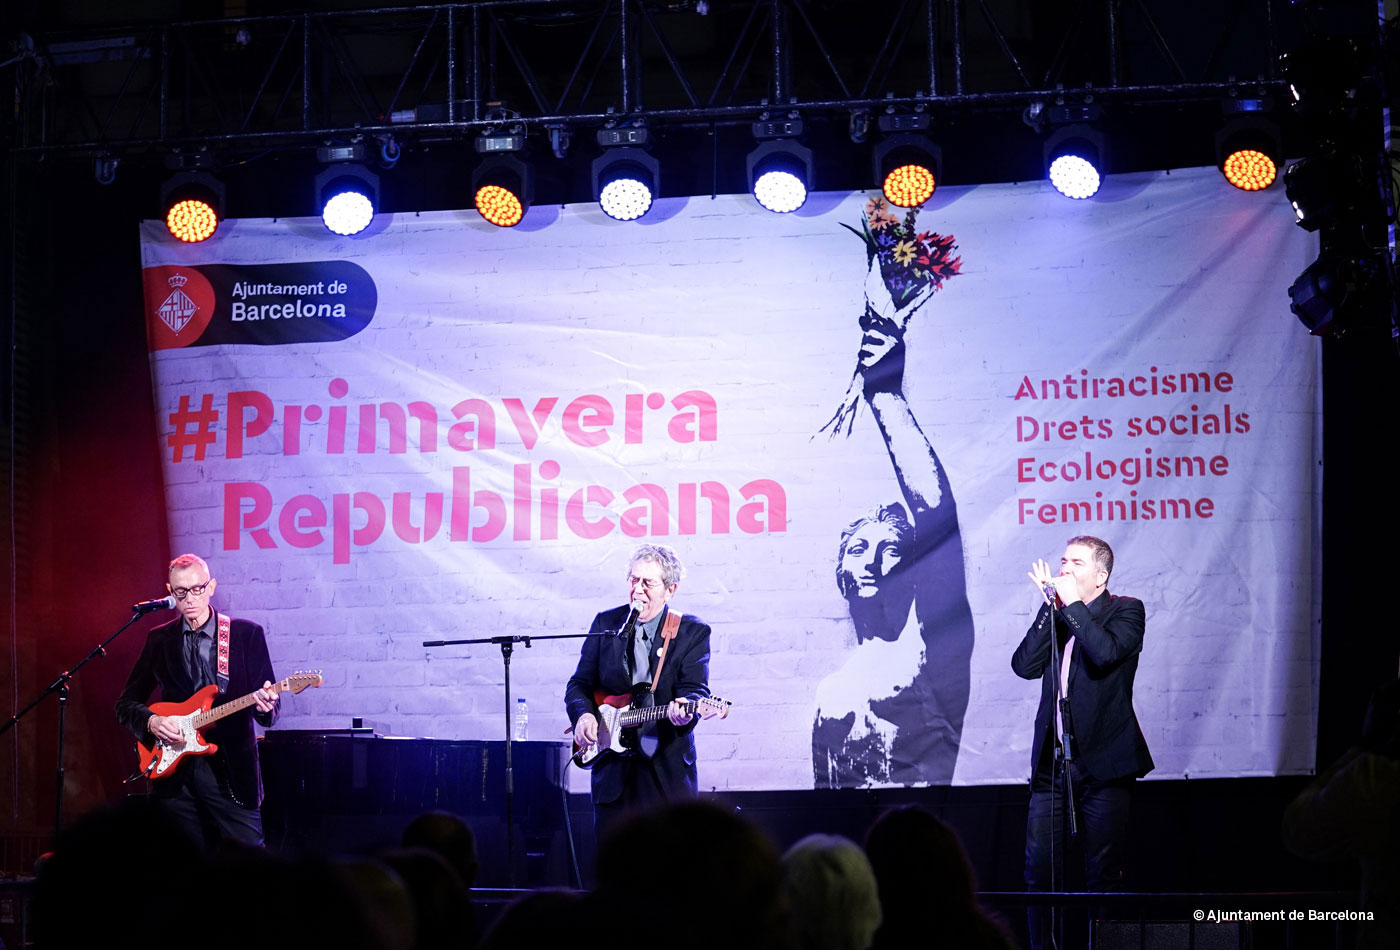 musita-concierto-primavera-republicana